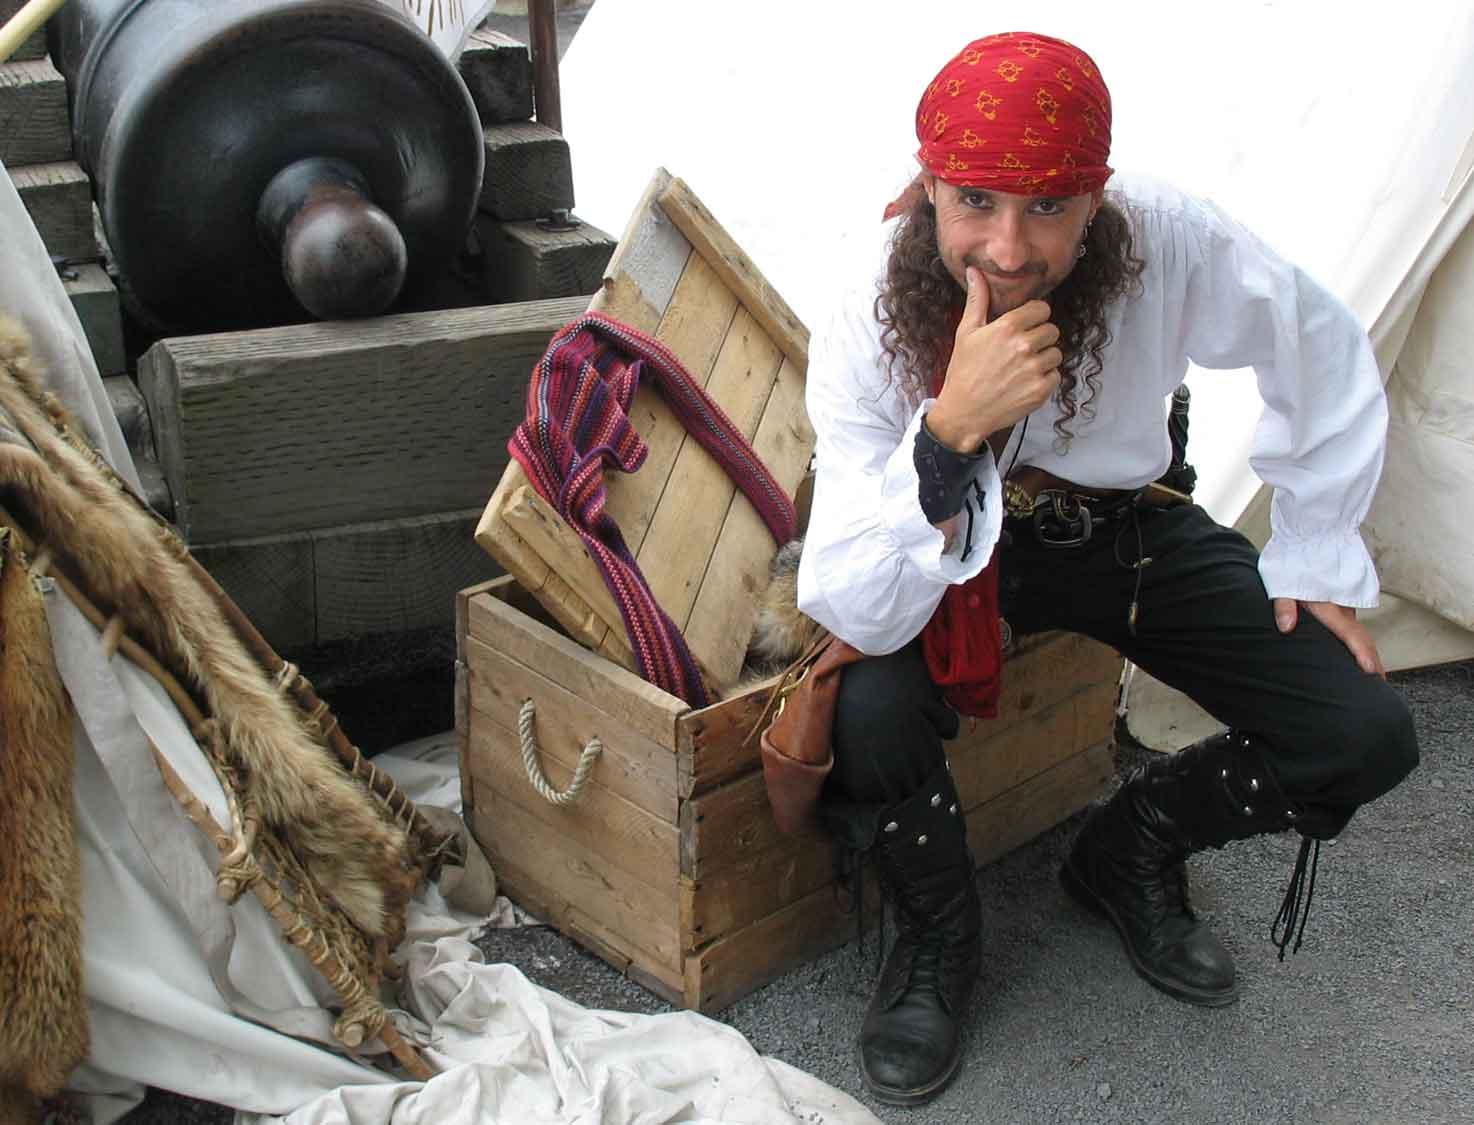 Pirate Capitaine Loran prêt à tirer avec le canon